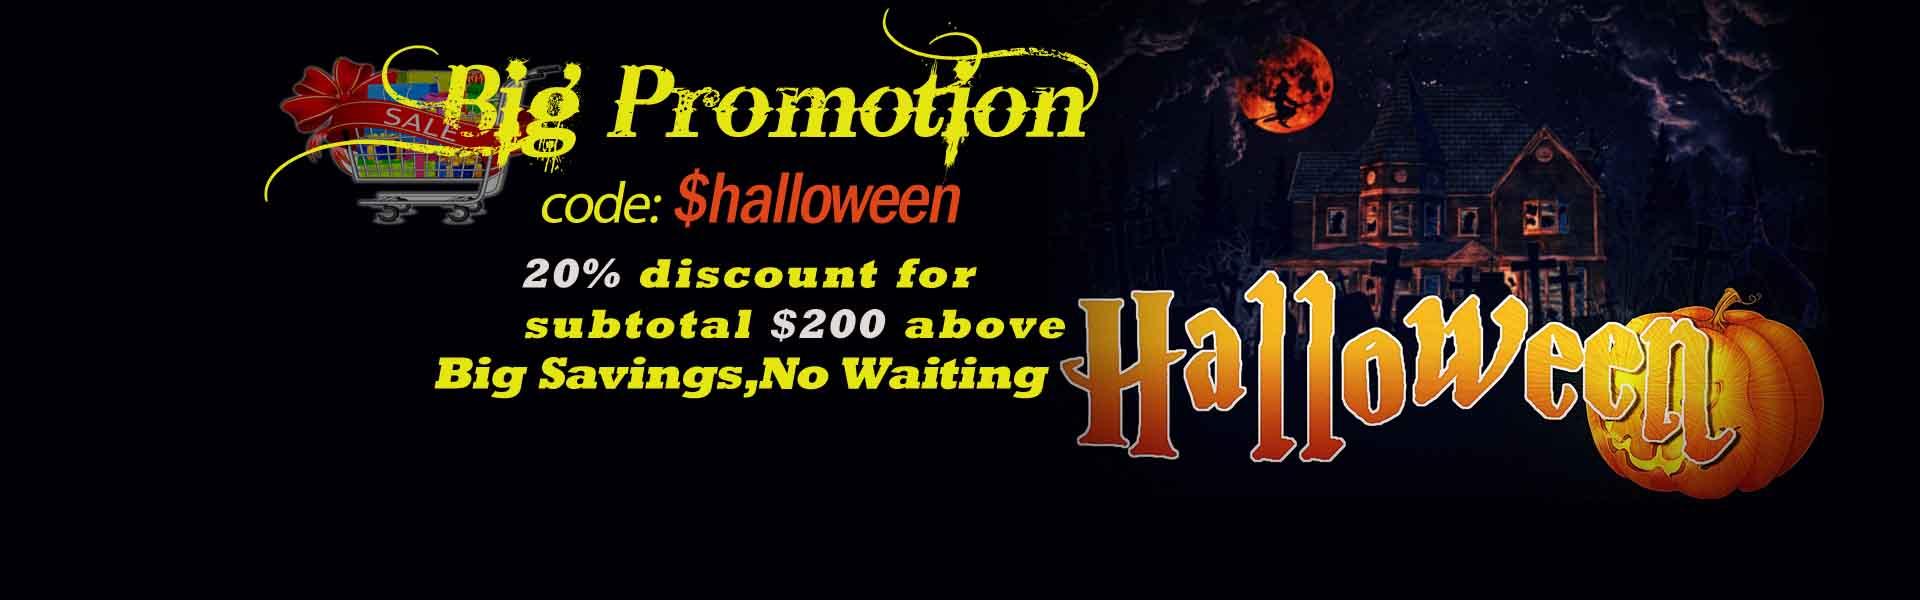 promotion 2019 Halloween Celebration